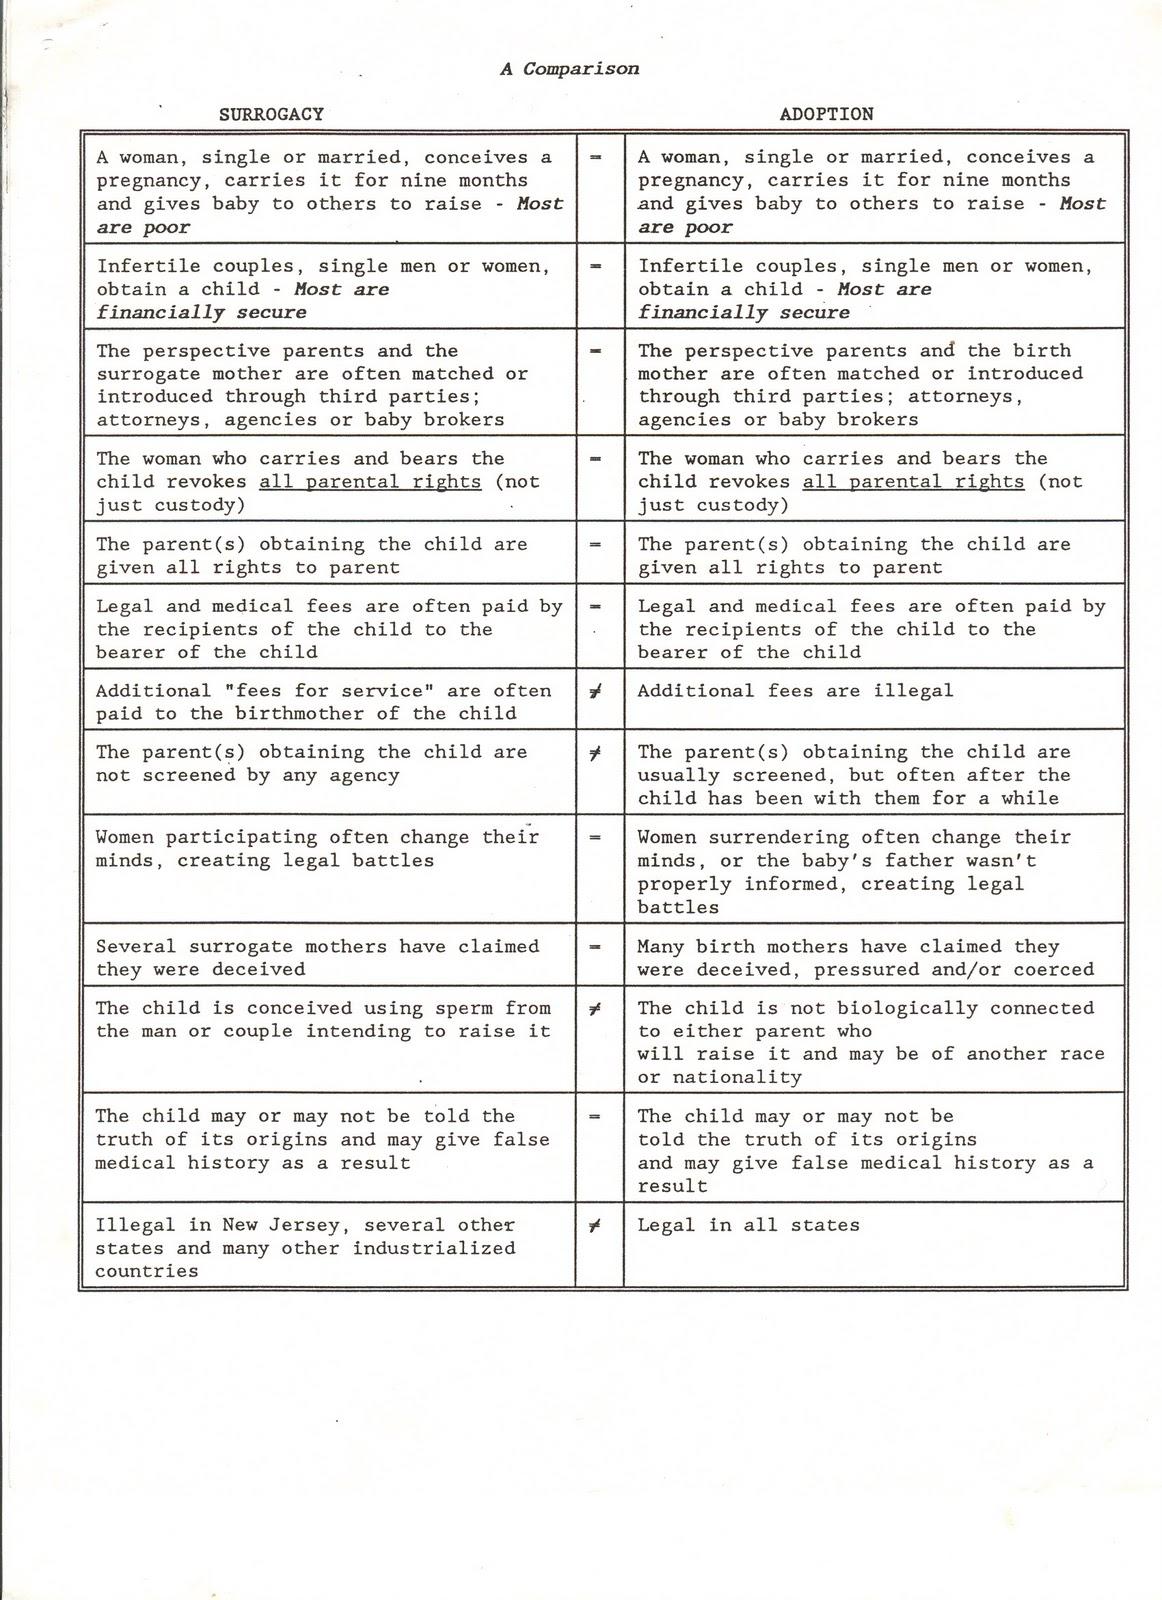 i need help writing an argumentative essay on gay marriage i need help writing an argumentative essay on gay marriage